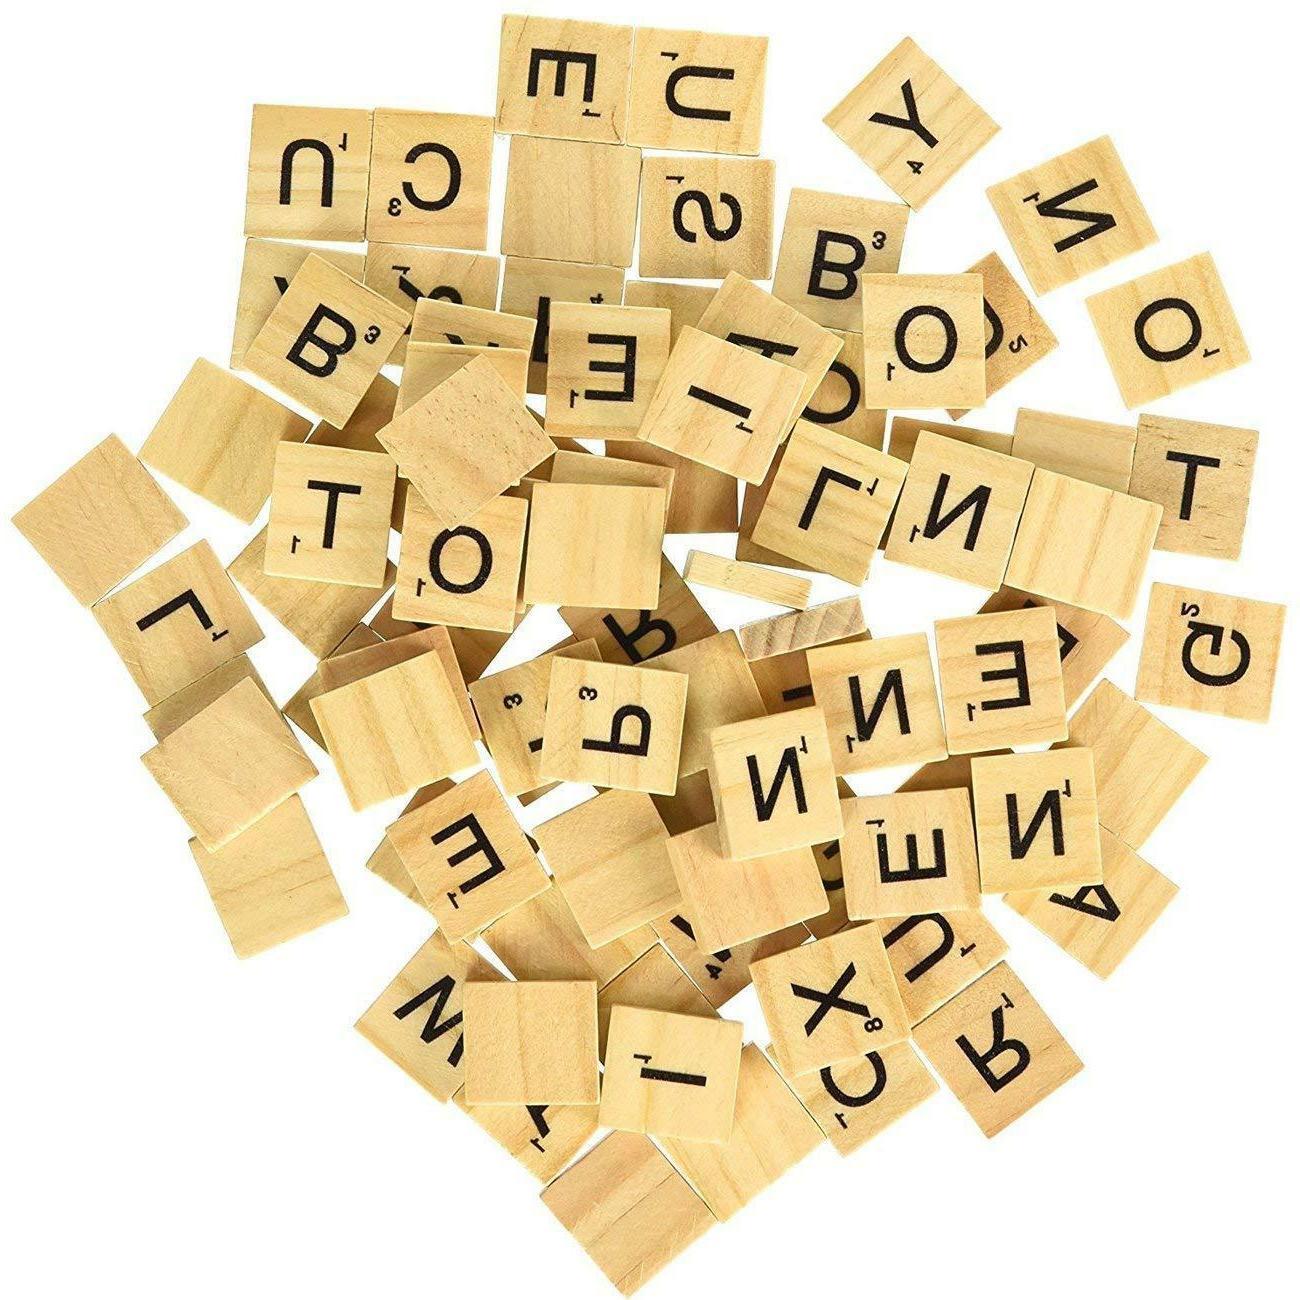 SCRABBLE Pieces Sets Wooden Replacement